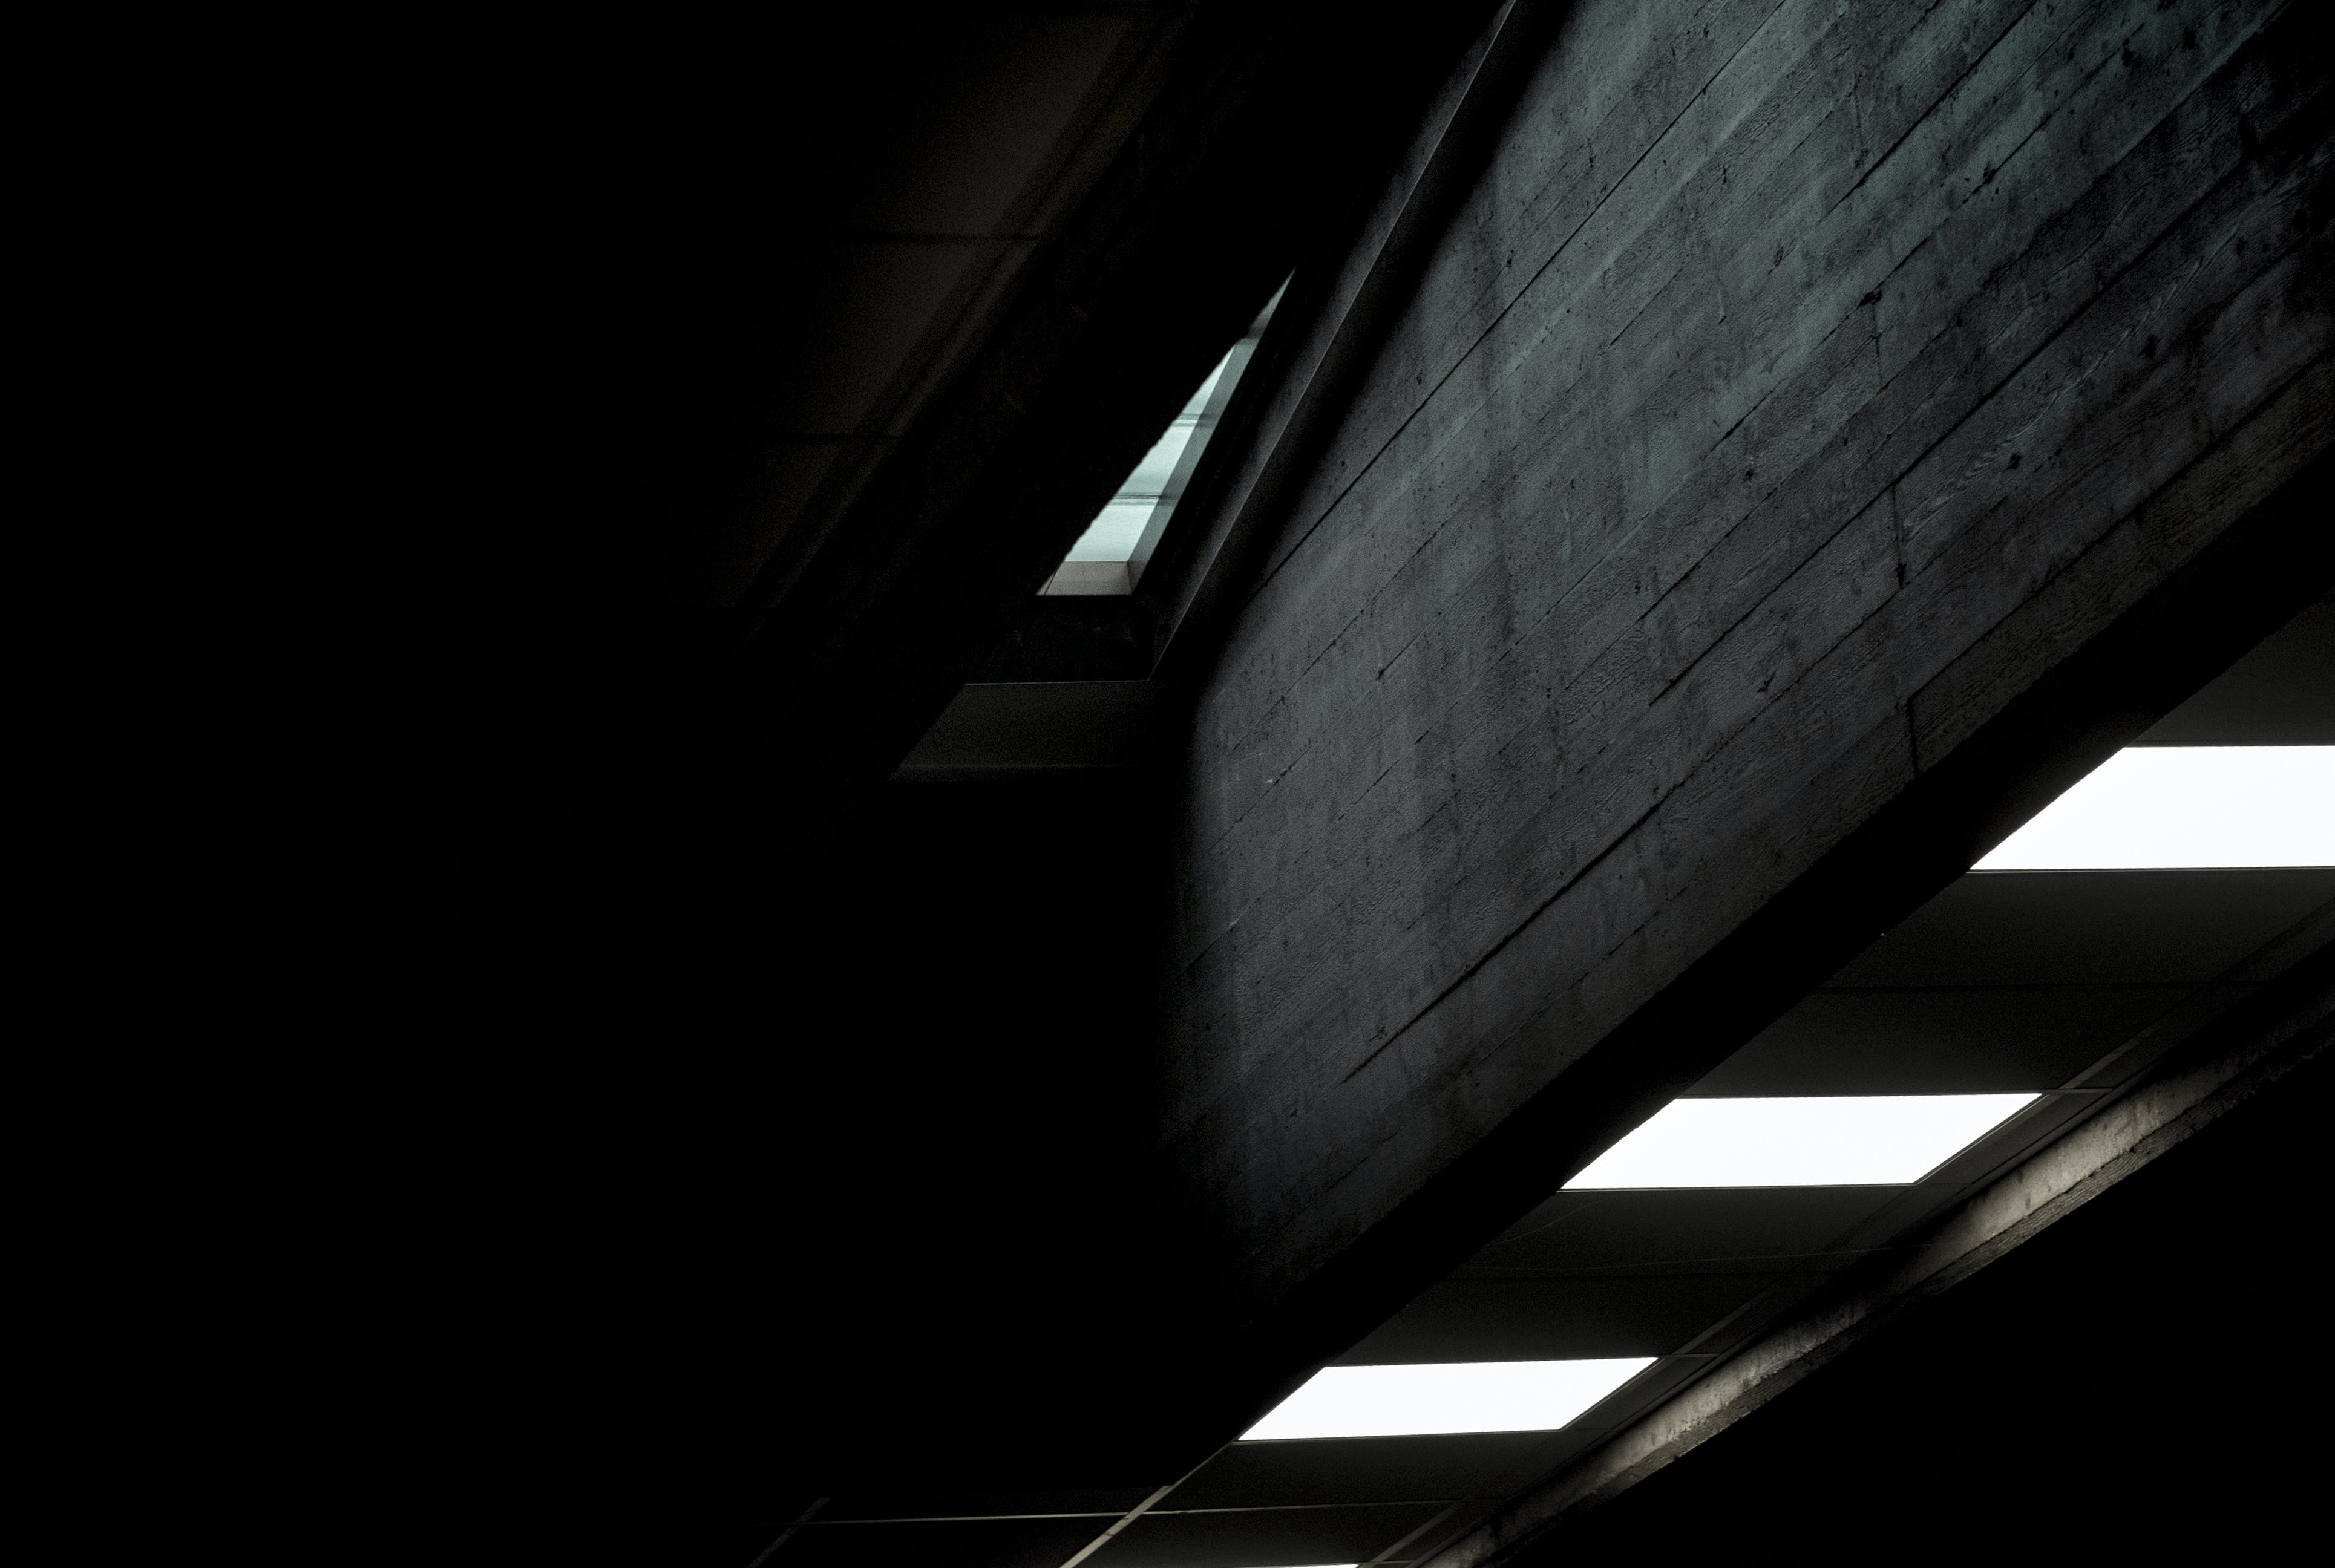 Desktop background of lights, dark, glass, wooden